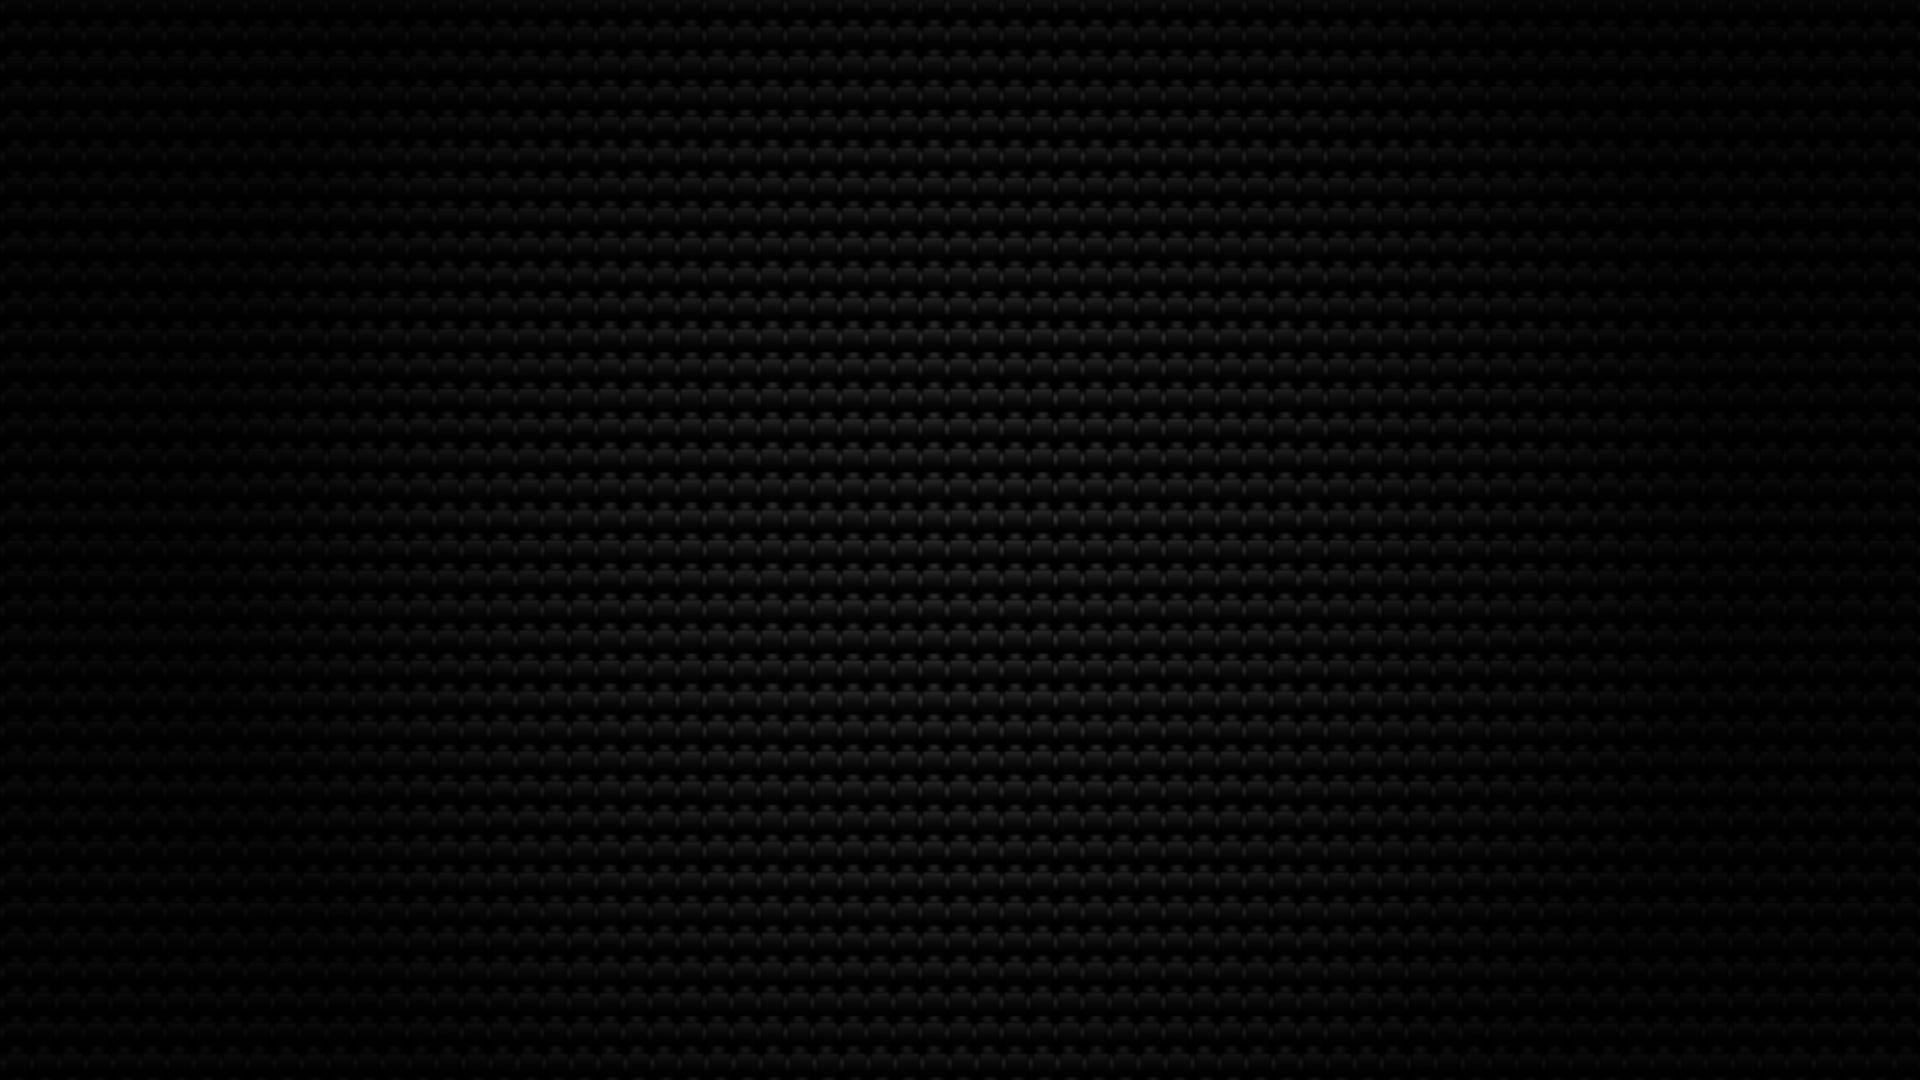 Black Background Of Carbon